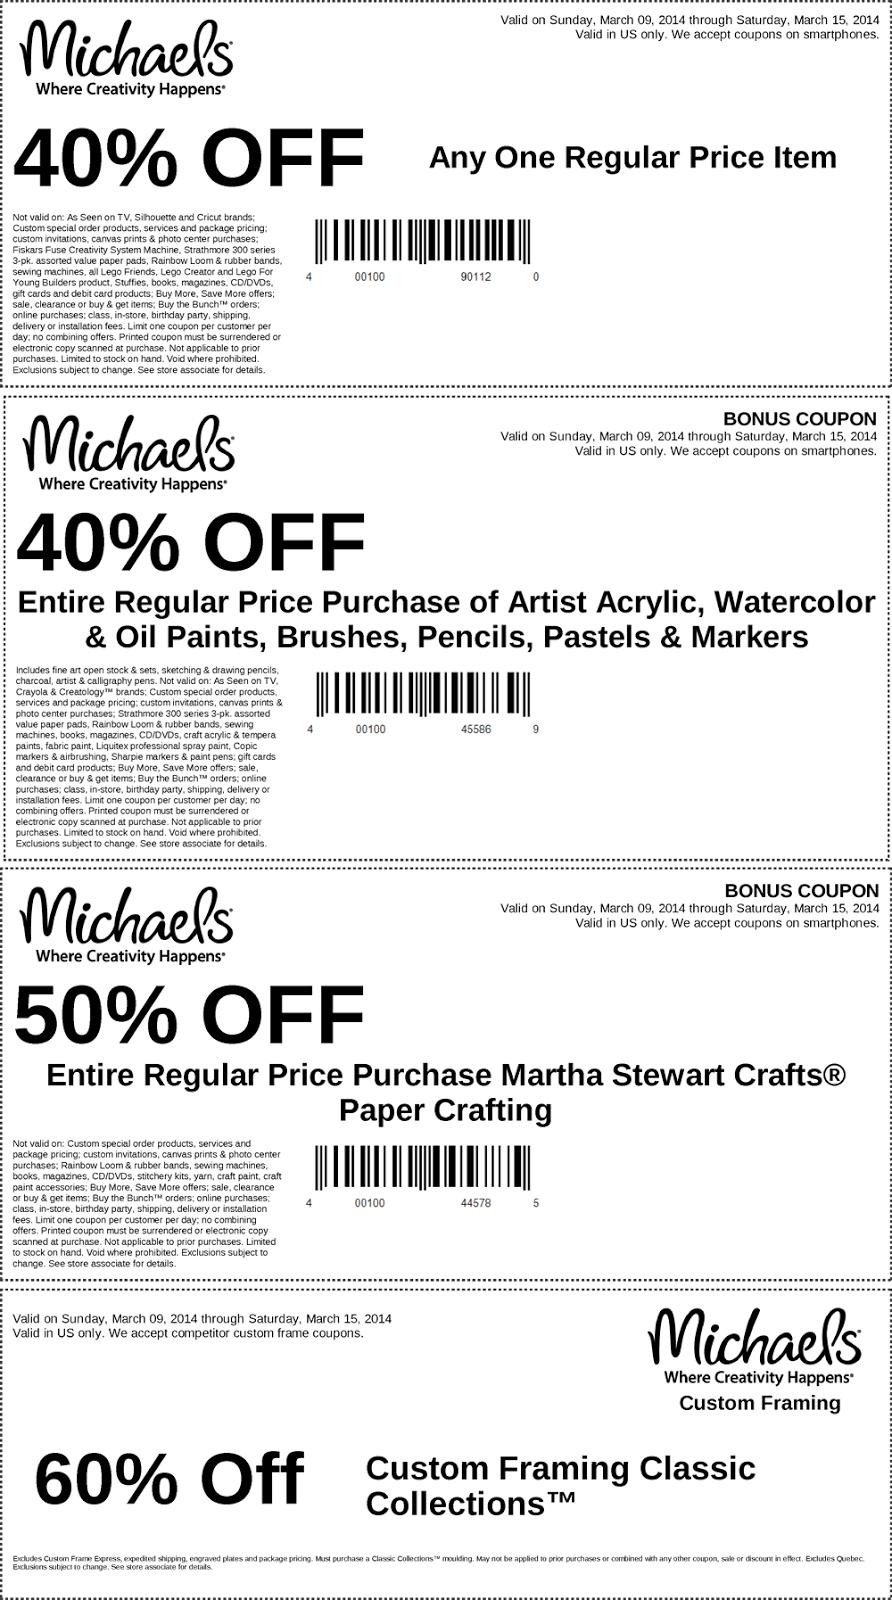 Michaels coupona - Ugg store sf